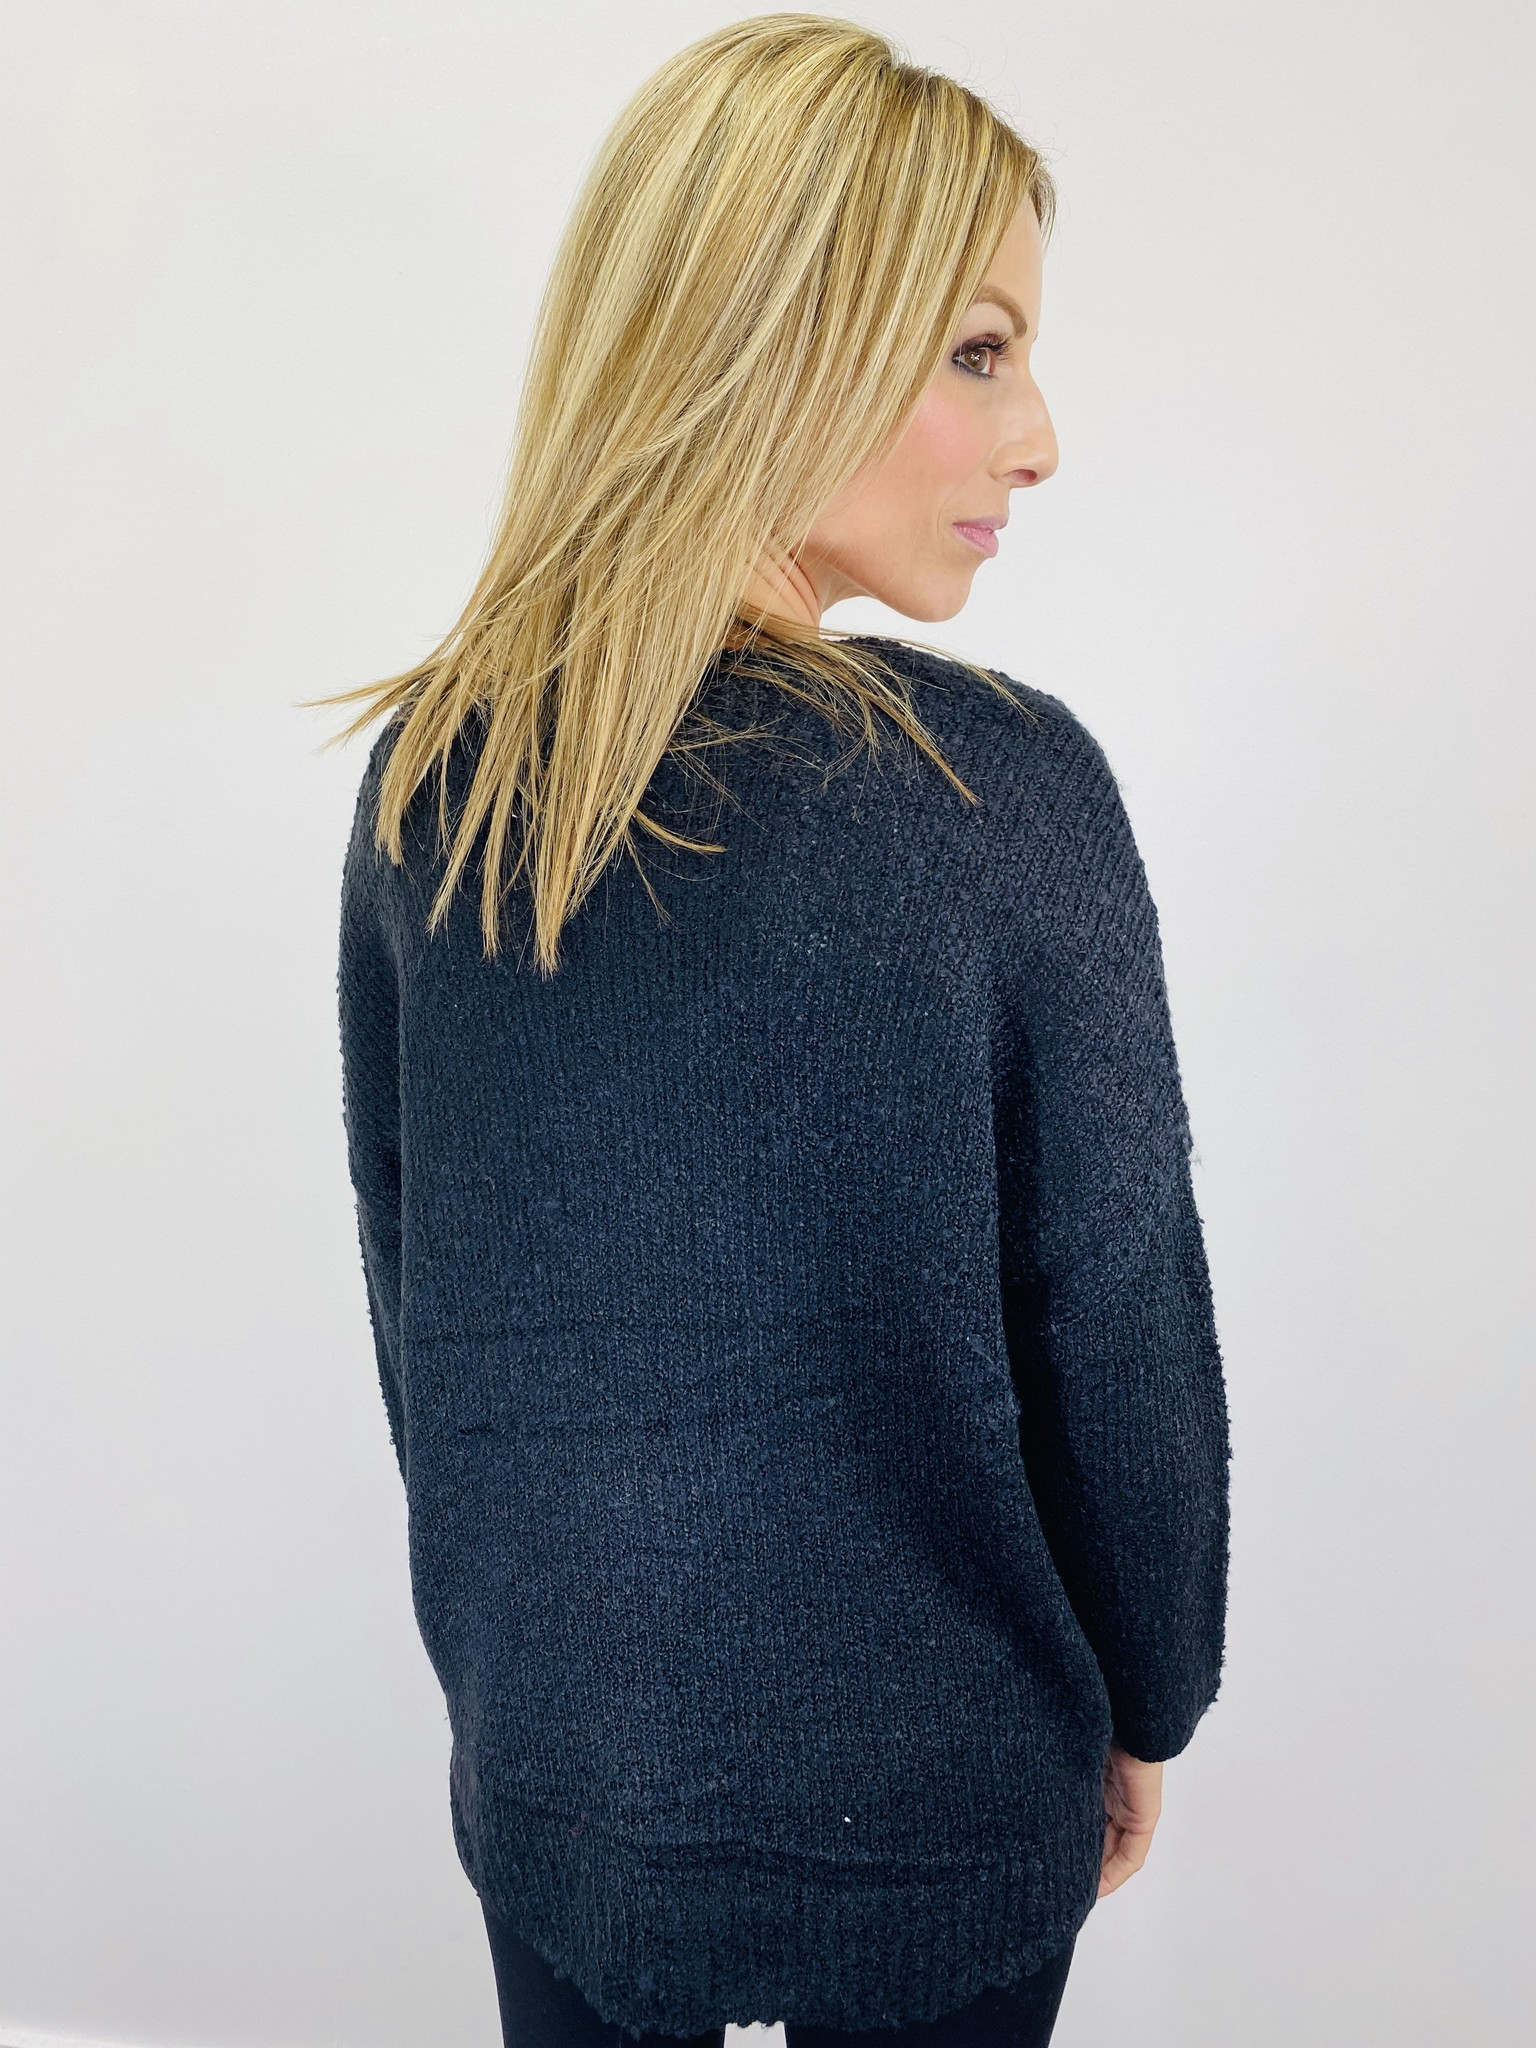 Jack by BB Dakota V That Way Slouchy Sweater in Black